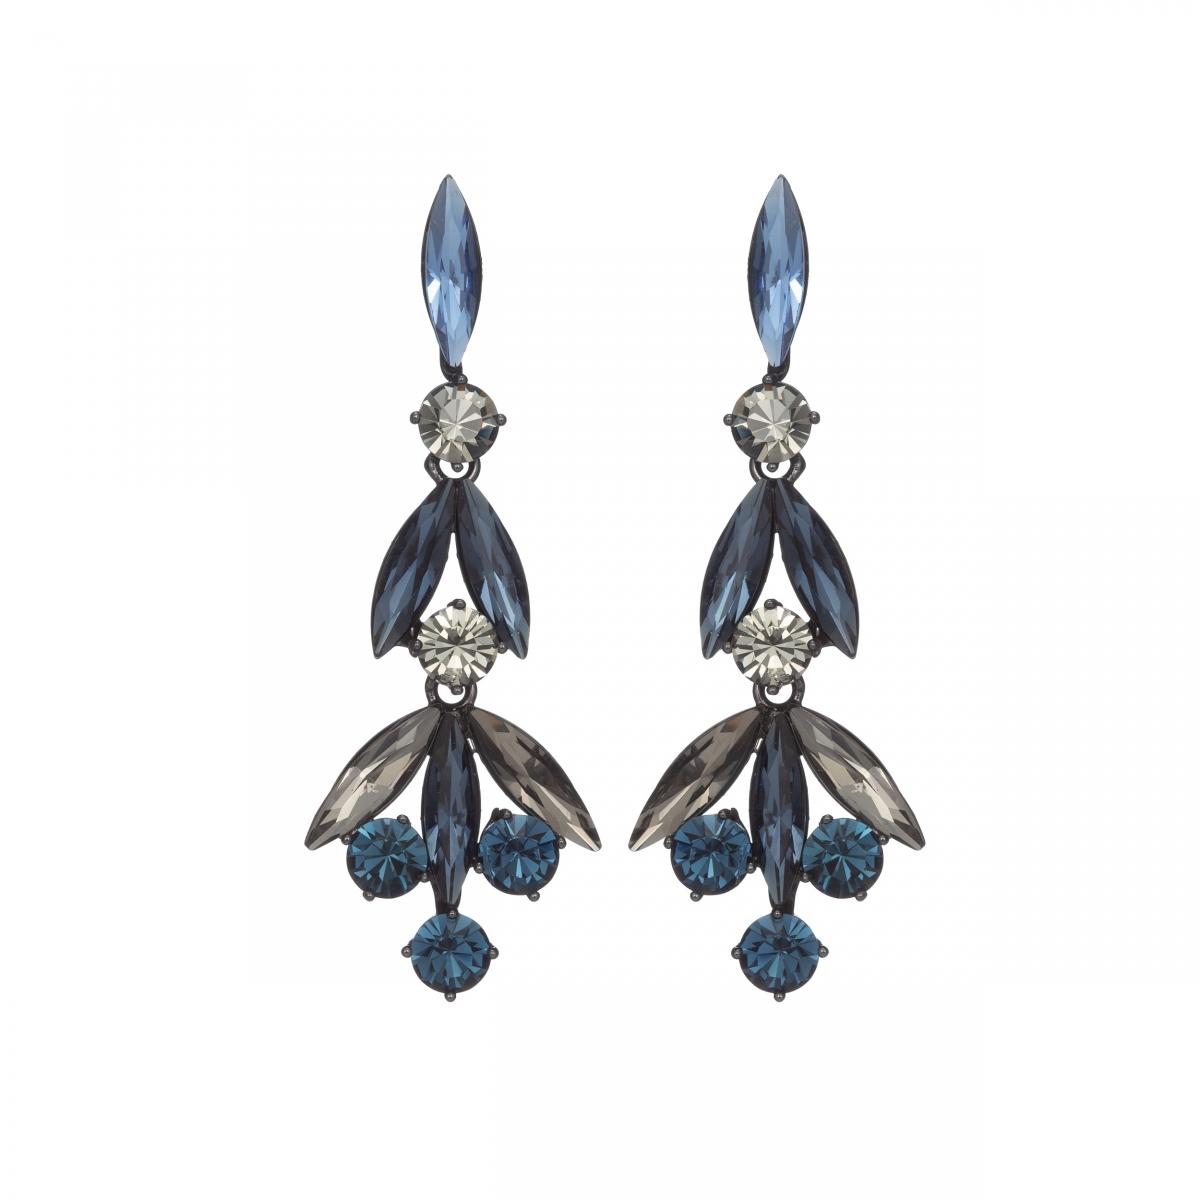 Náušnice Lilly Fine Exclusive Elegance Dark Blue Crystals Black Metal